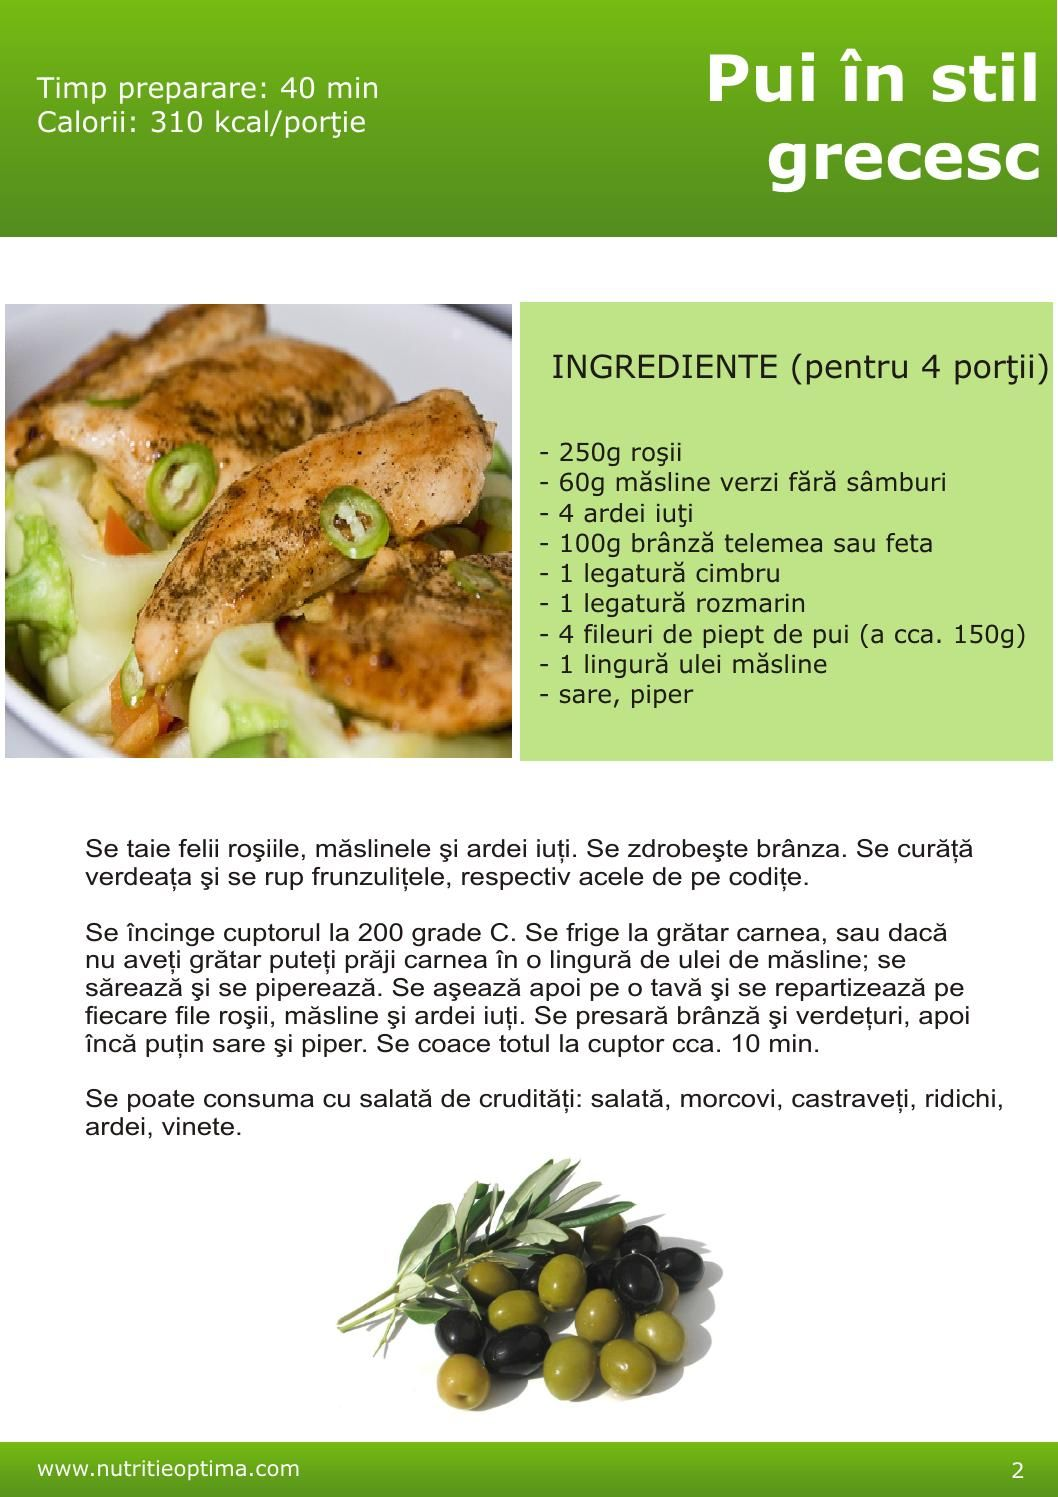 Fitness Food +900 Retete - Plan Alimentar - Slabire, Mentinere, Crestere masa musculara